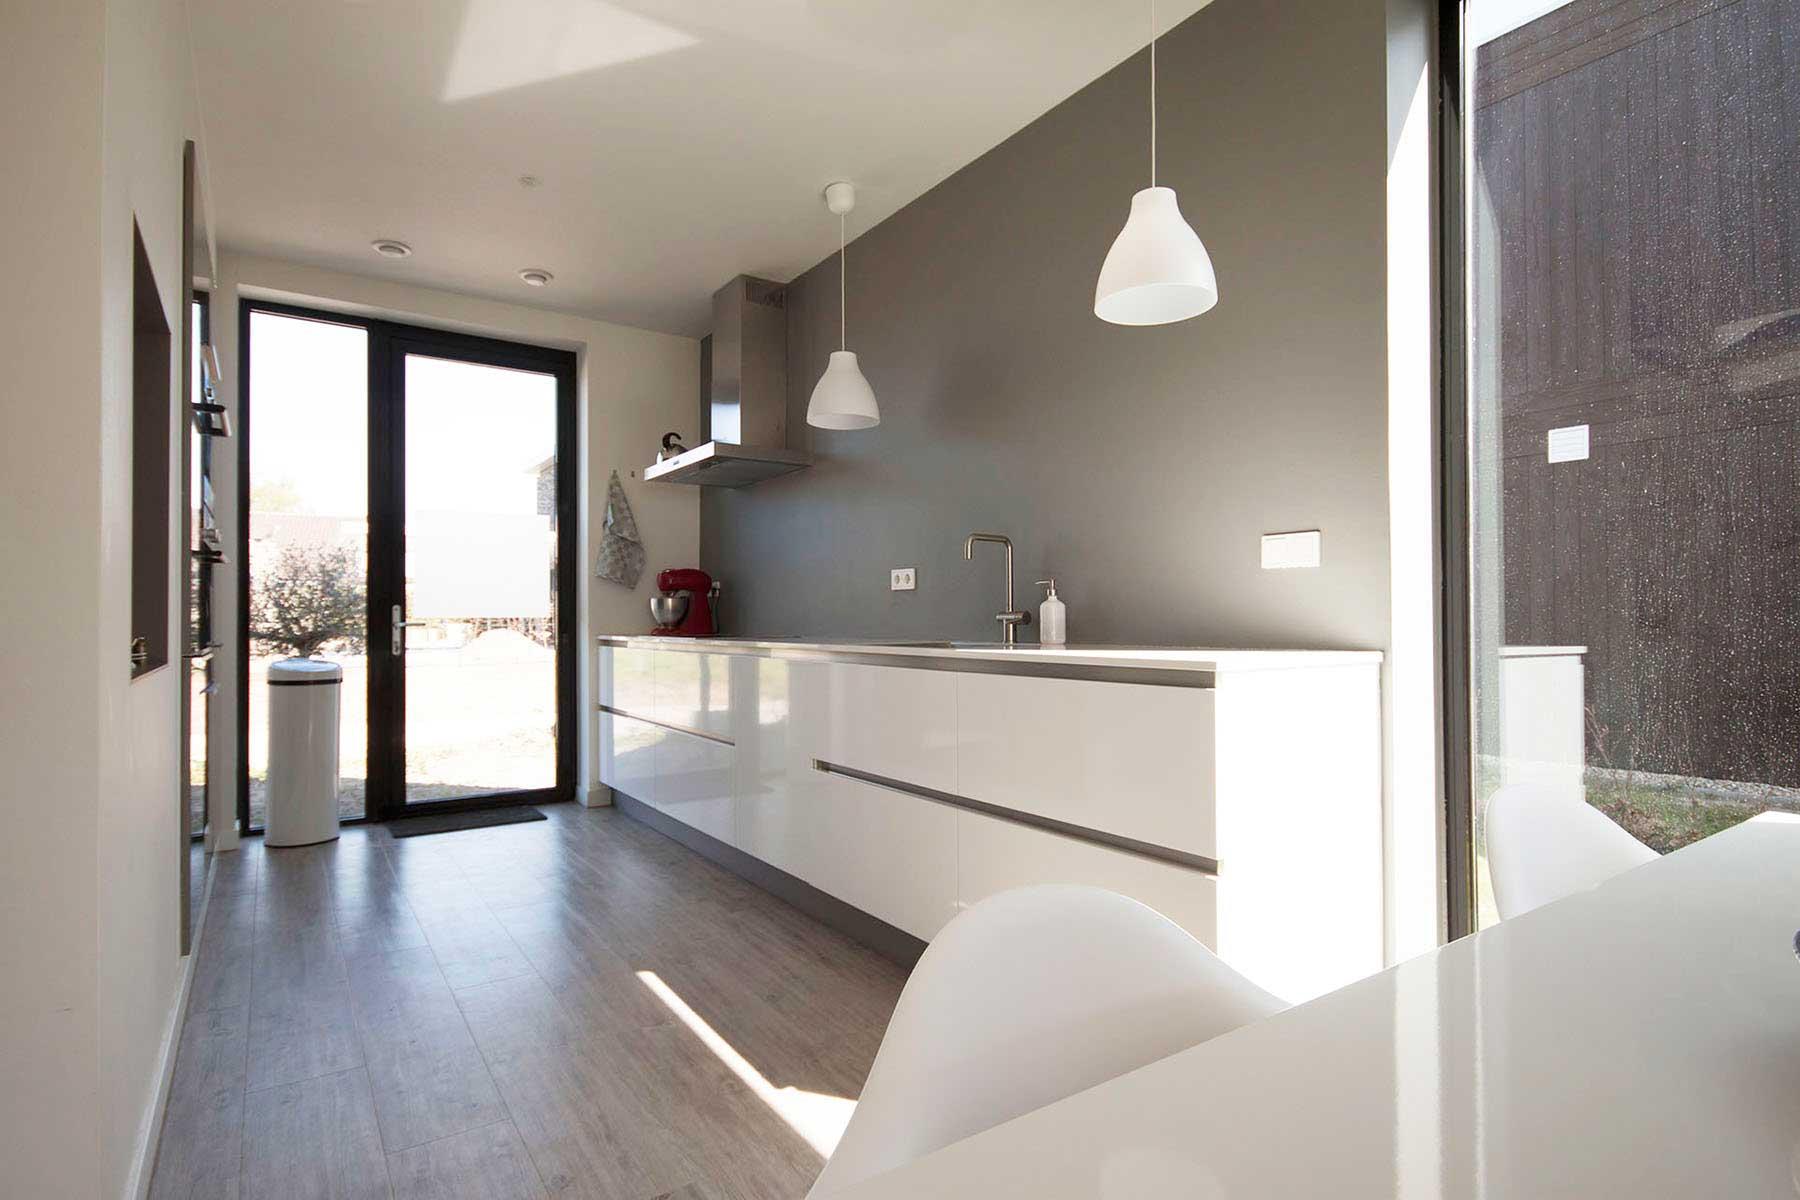 8A-Architecten-datcha-house-2-Lent-08